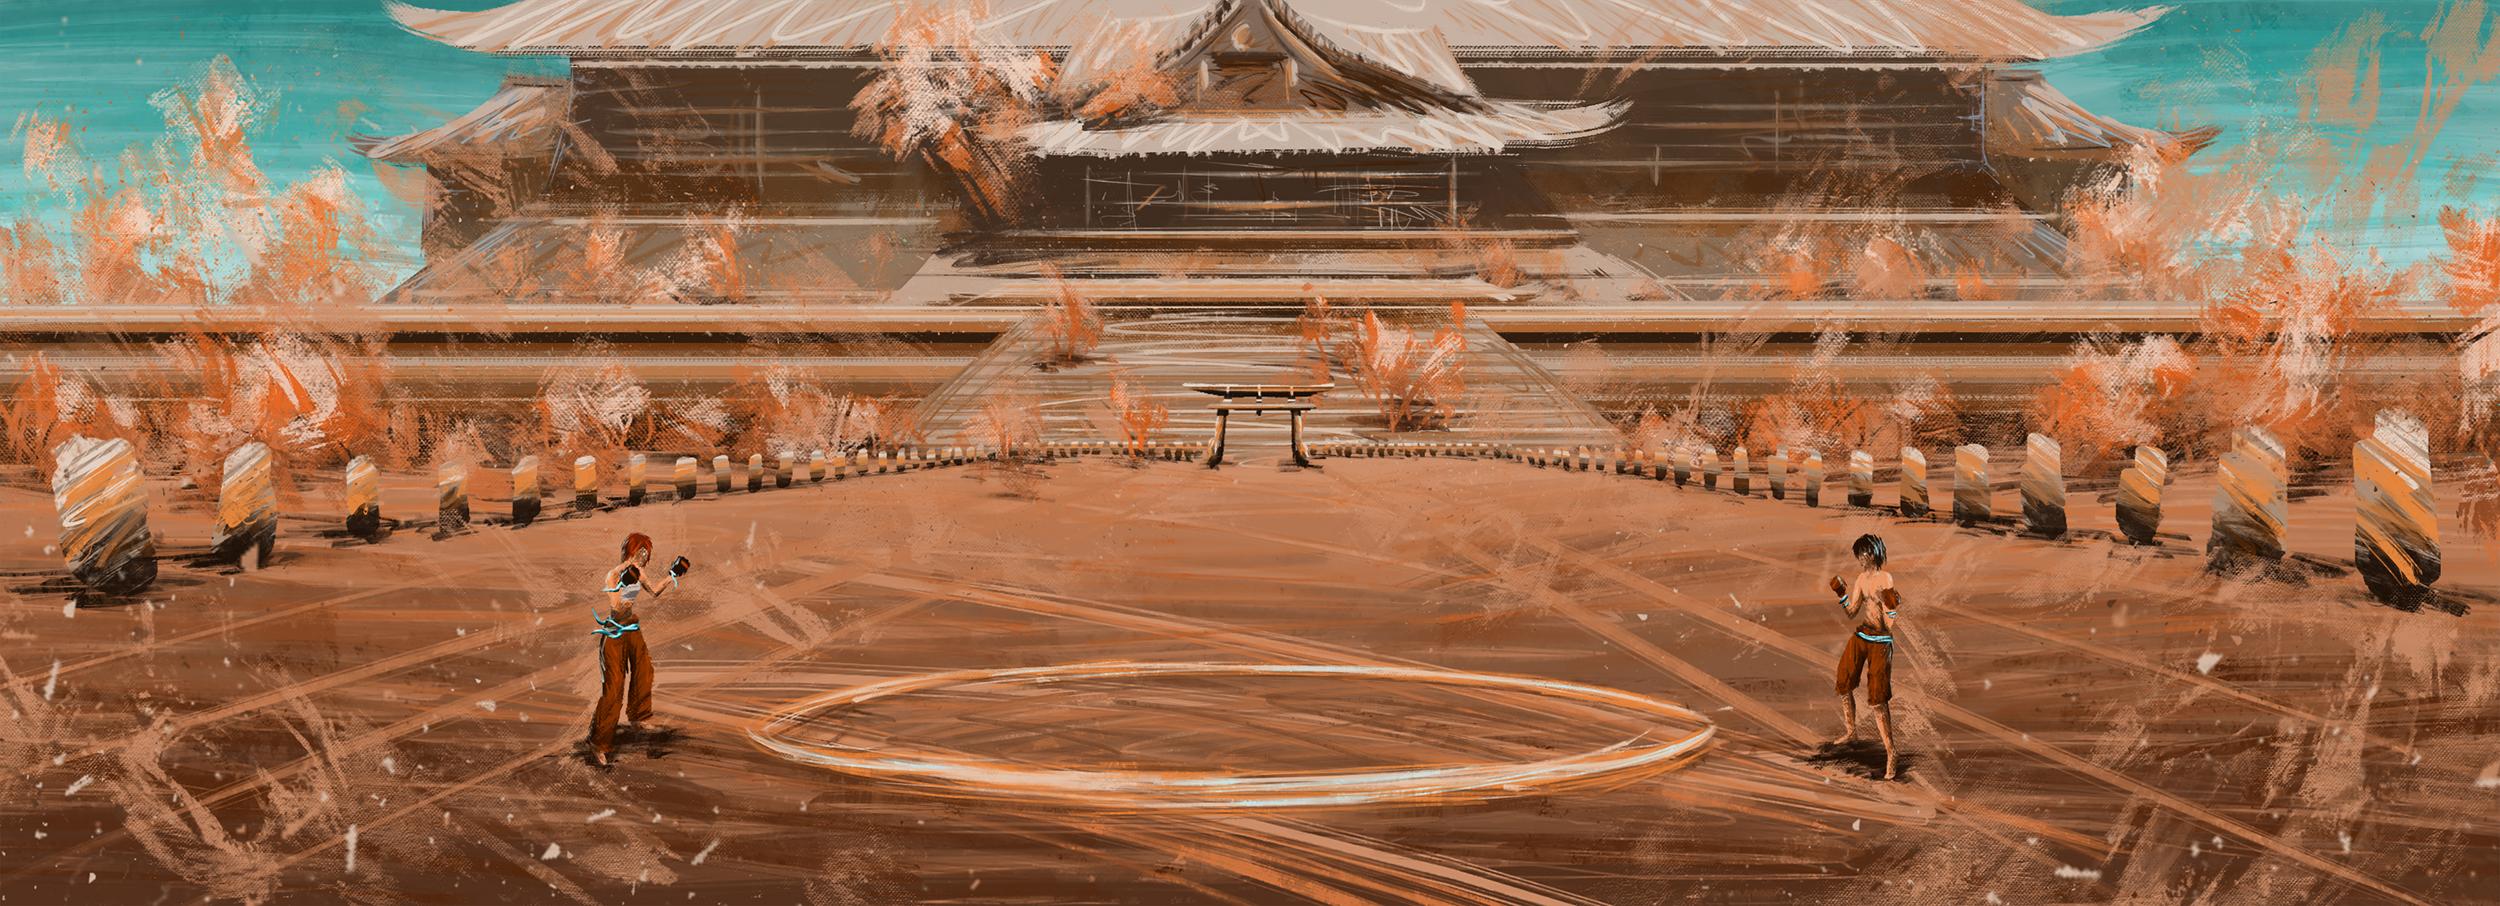 Arena - 01 - Fight